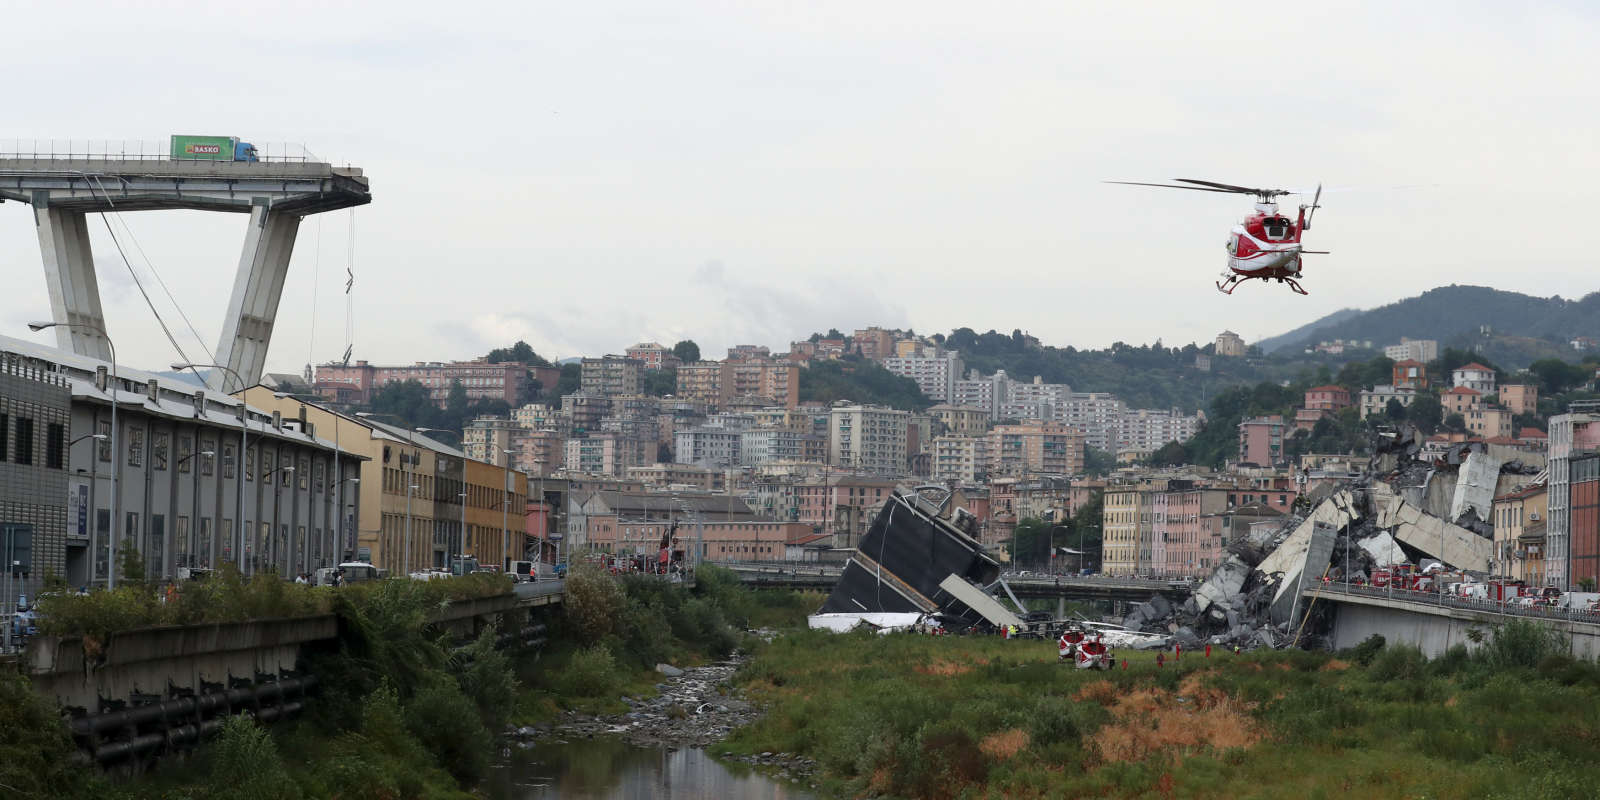 A rescue helicopter flies over the collapsed Morandi Bridge in the Italian port city of Genoa, Italy August 14, 2018. REUTERS/Stefano Rellandini